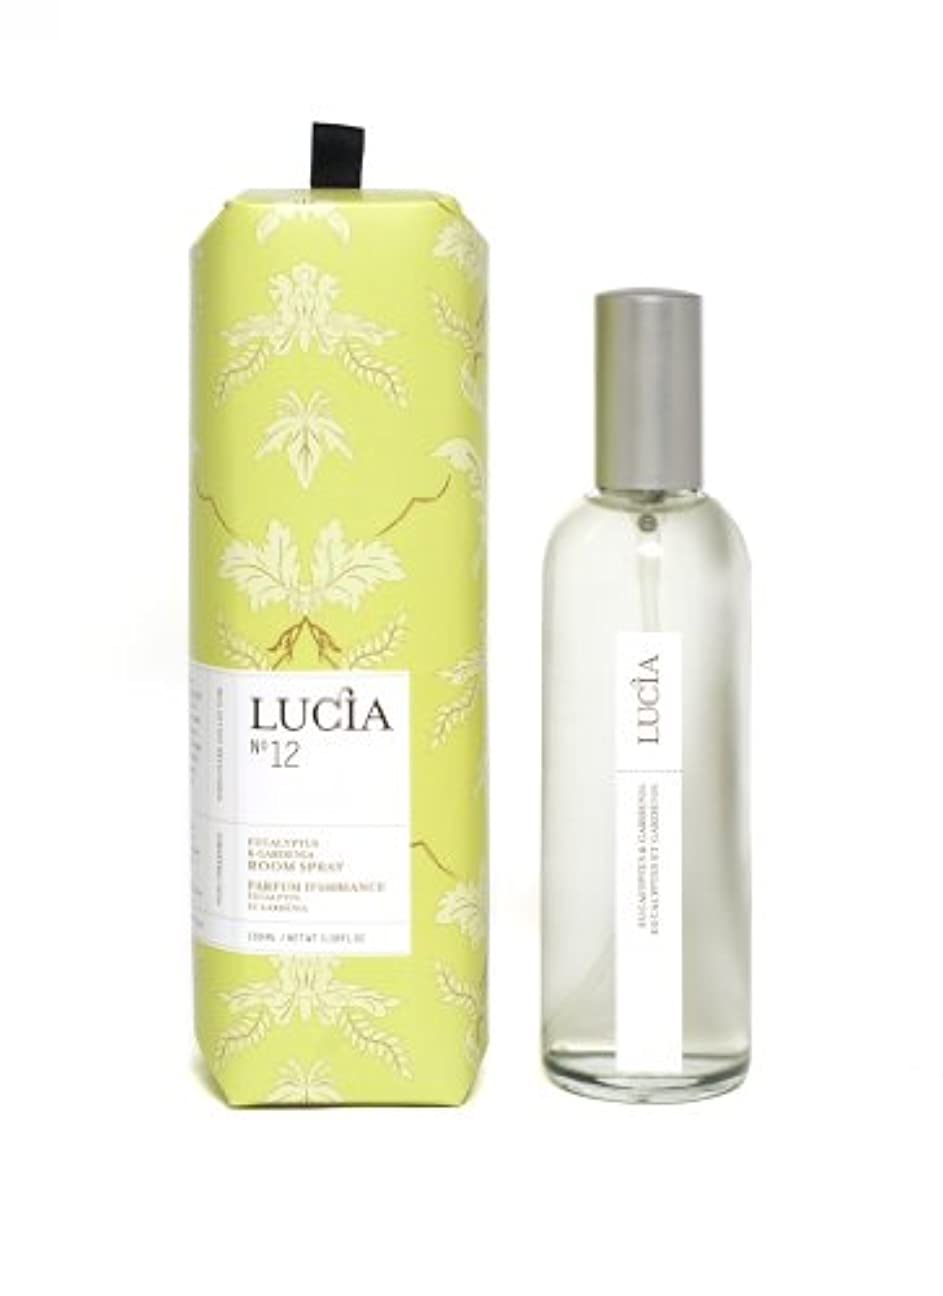 LUCIA Collection ルームスプレー No.12 ユーカリプタス&ガーデニア Eucalyptus&Gardenia Room Spray ルシア コレクション ピュアリビング Pureliving